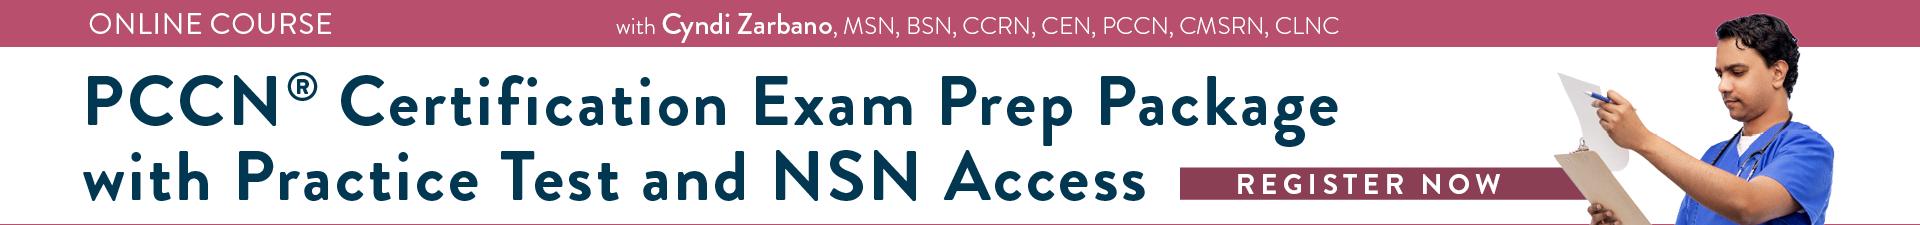 PCCN Exam Prep - Online Course